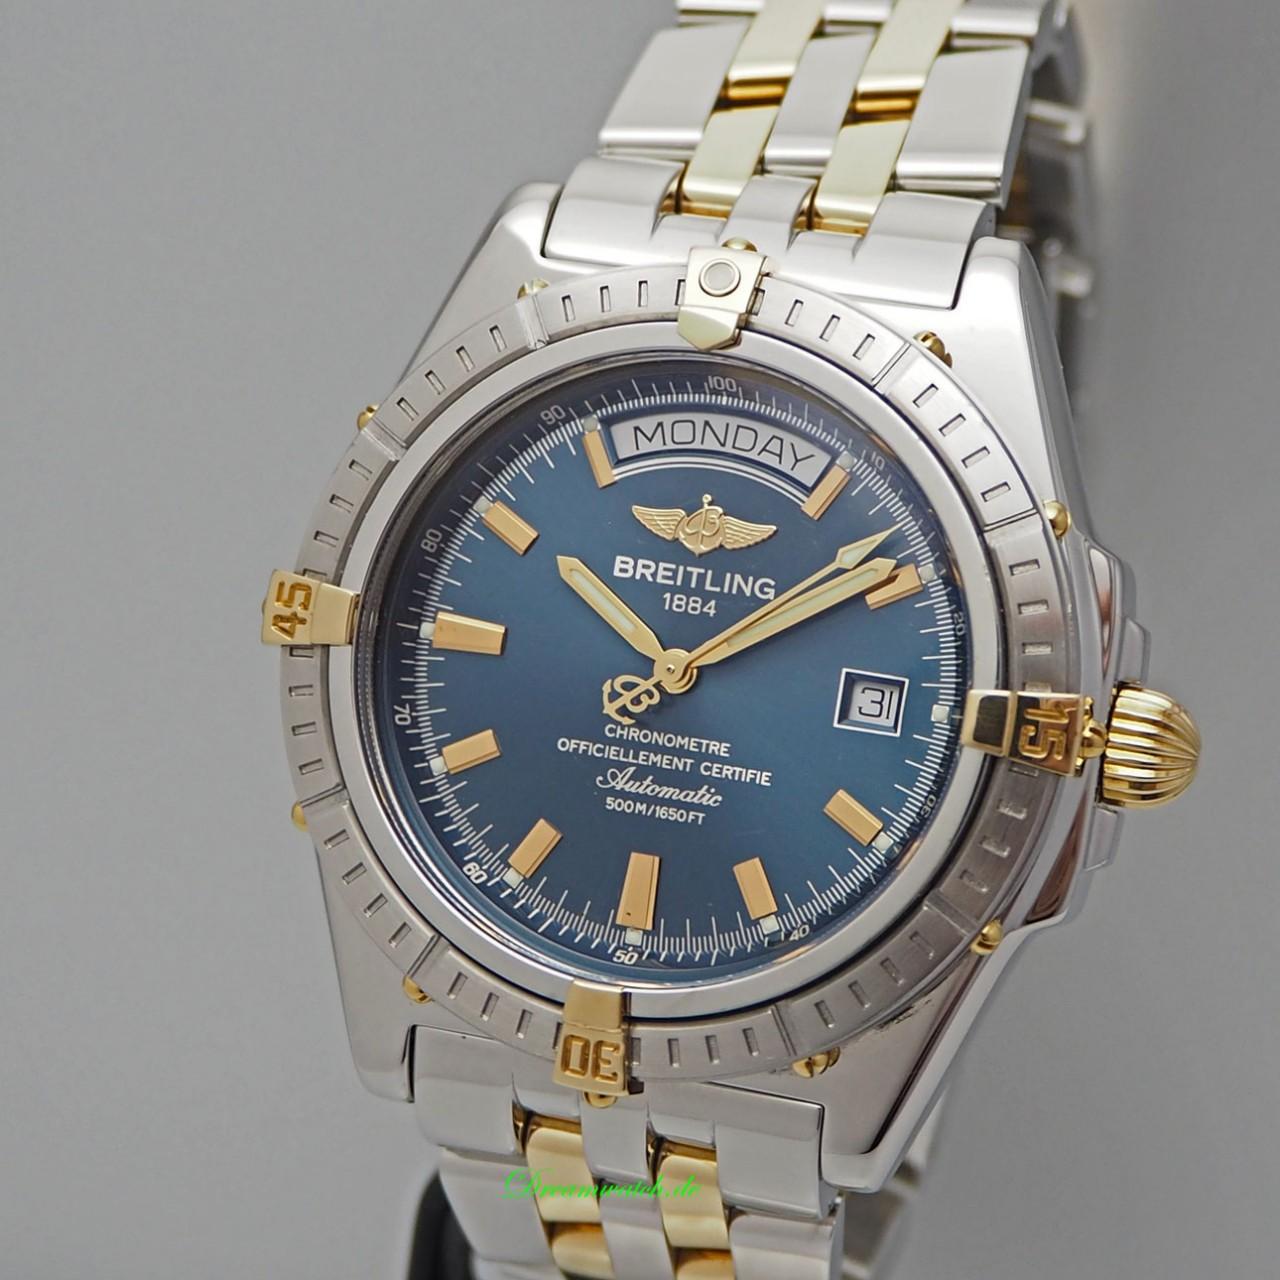 Breitling Headwind Automatik Chronometre B45355, Stahl/Gold, B&P